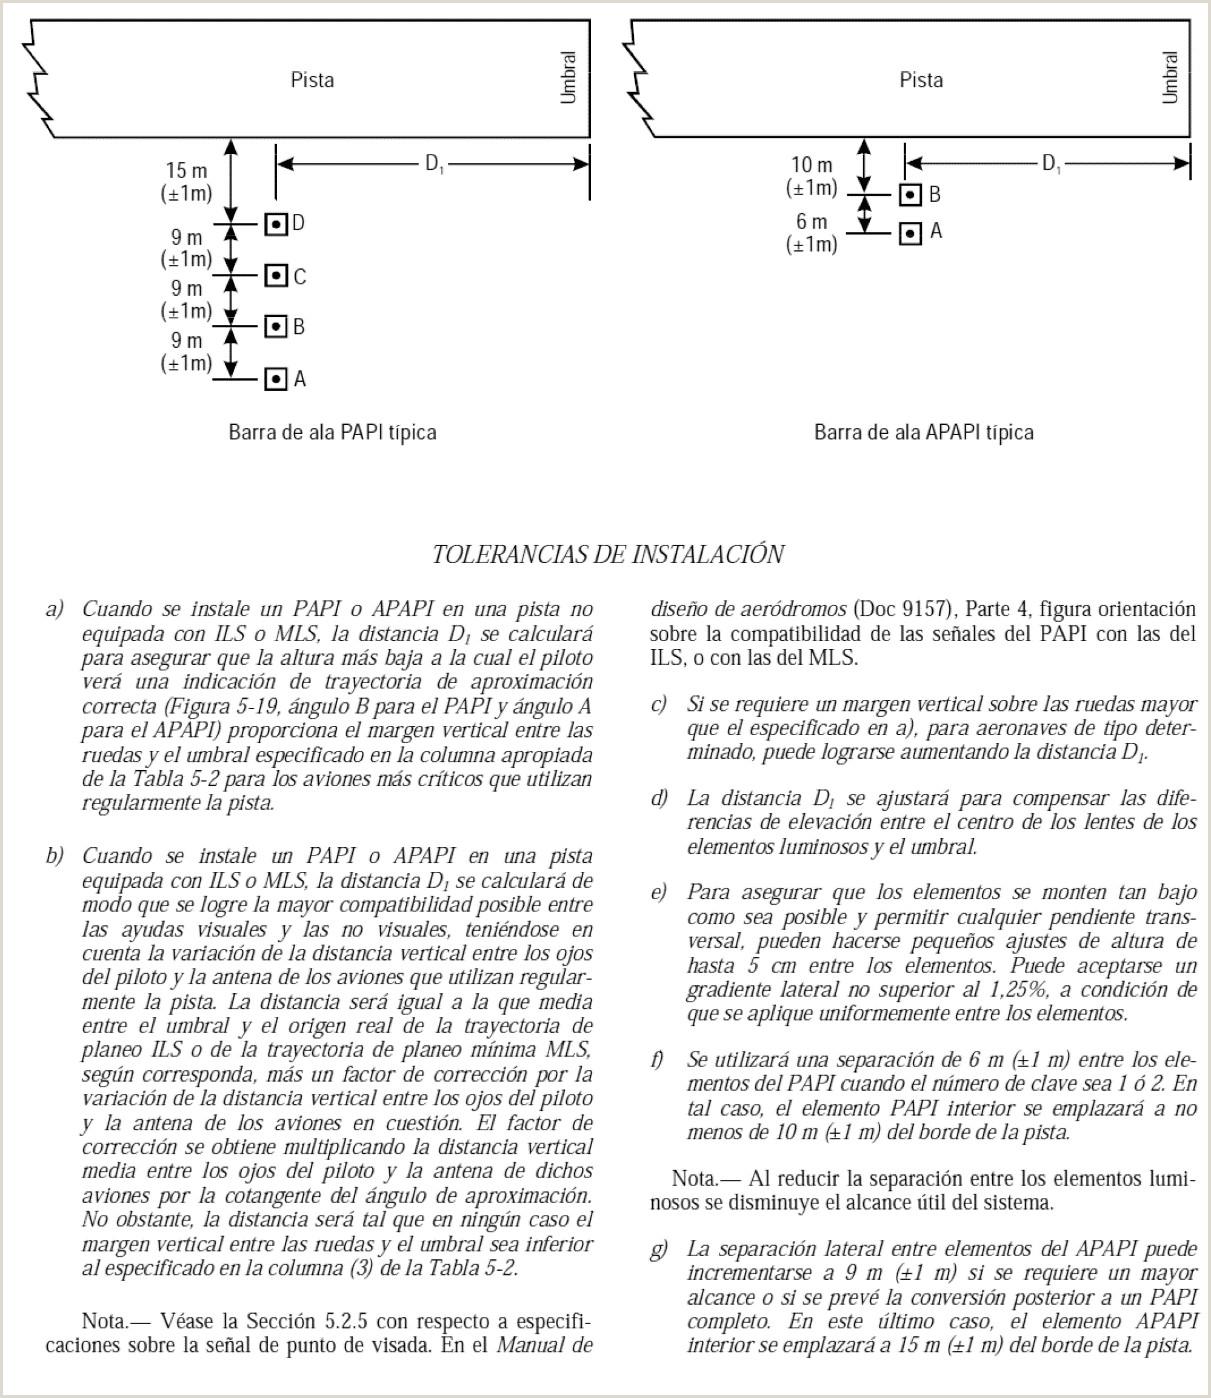 Descargar Hoja De Vida Con Perfil Profesional Boe Documento Consolidado Boe A 2009 9043